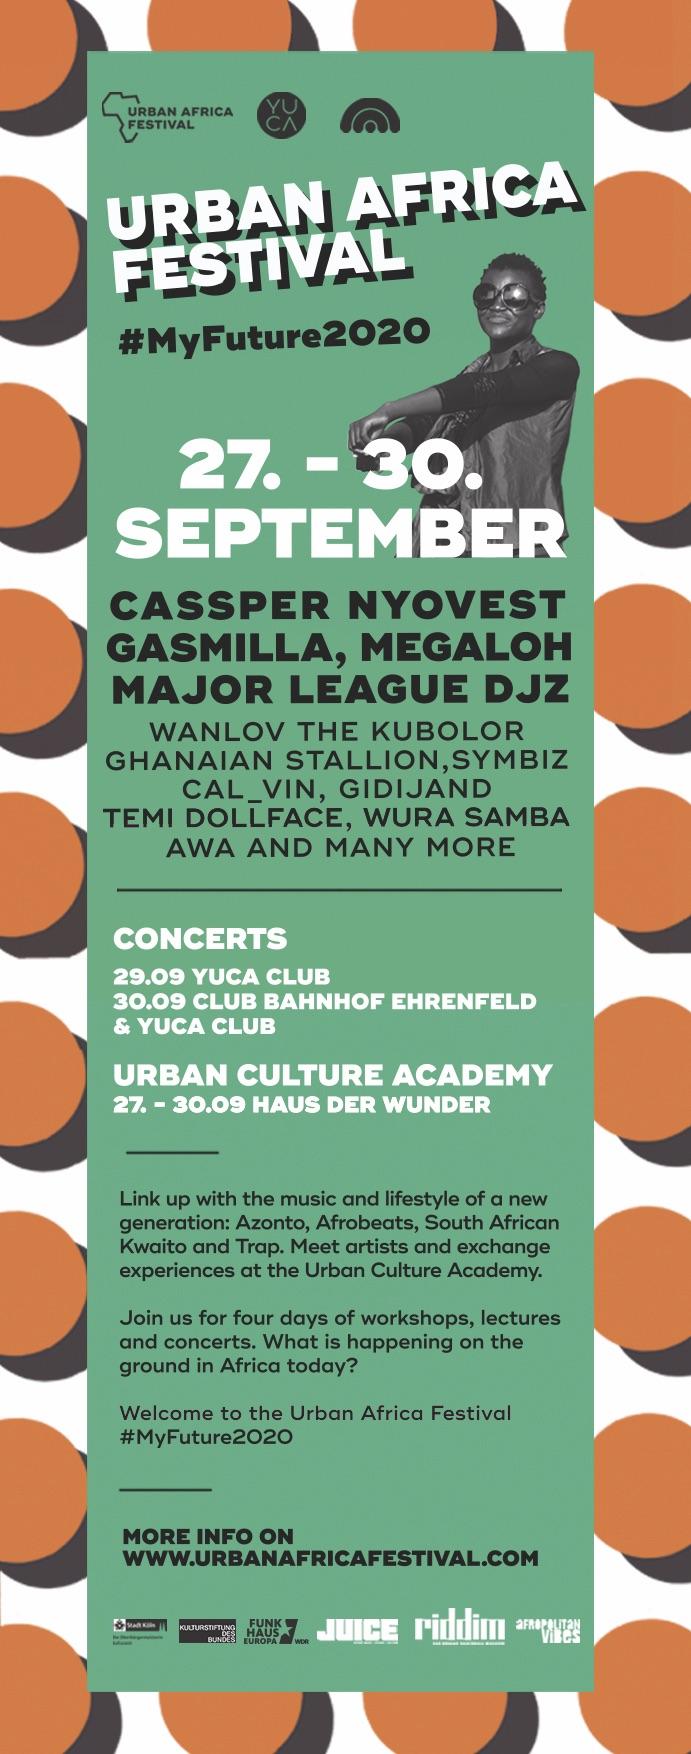 UrbanAfricaFestival